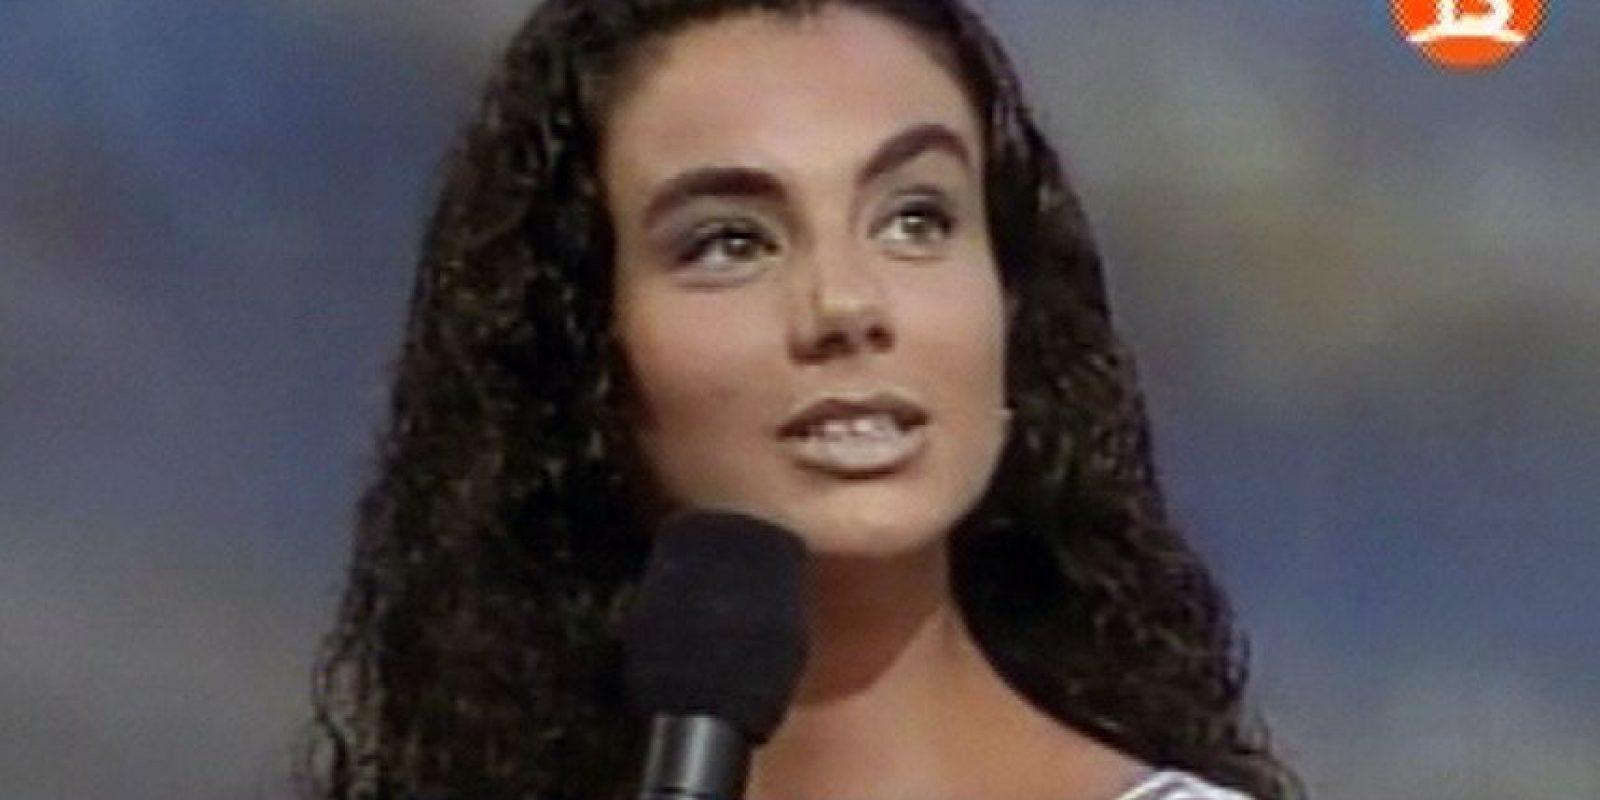 En 2001, Carolina Zuñiga se coronó como Miss Chile a pesar de elegir al Papa y a la Madre Teresa de Calcuta para preervar la especie humana en caso de un holocausto nuclear. Foto:Twitter